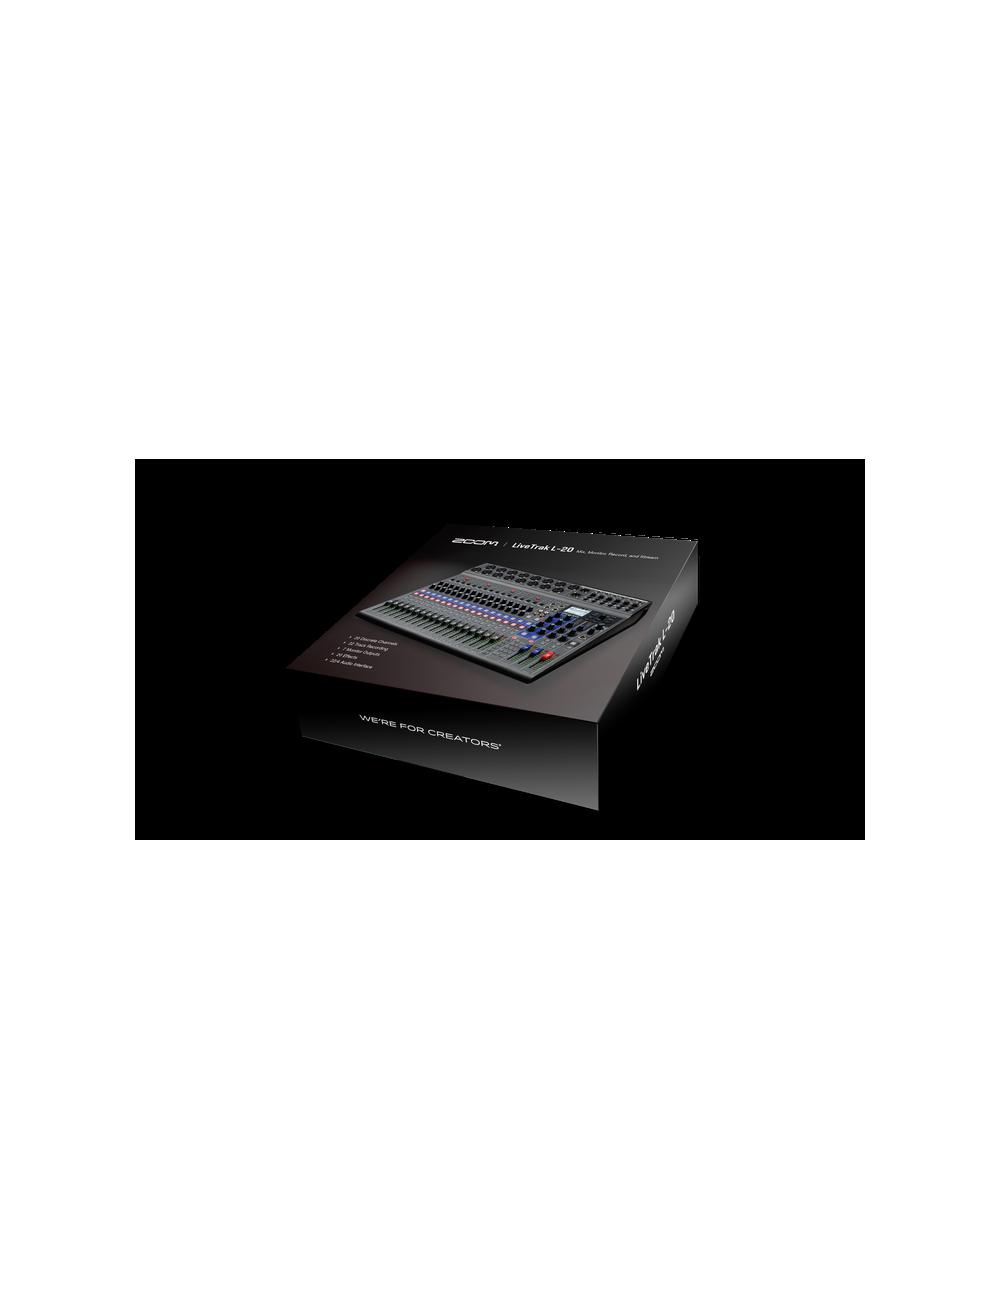 Flash Esclavo de Estudio 45w GODOX S45T Con Base E27 (como ampolleta)